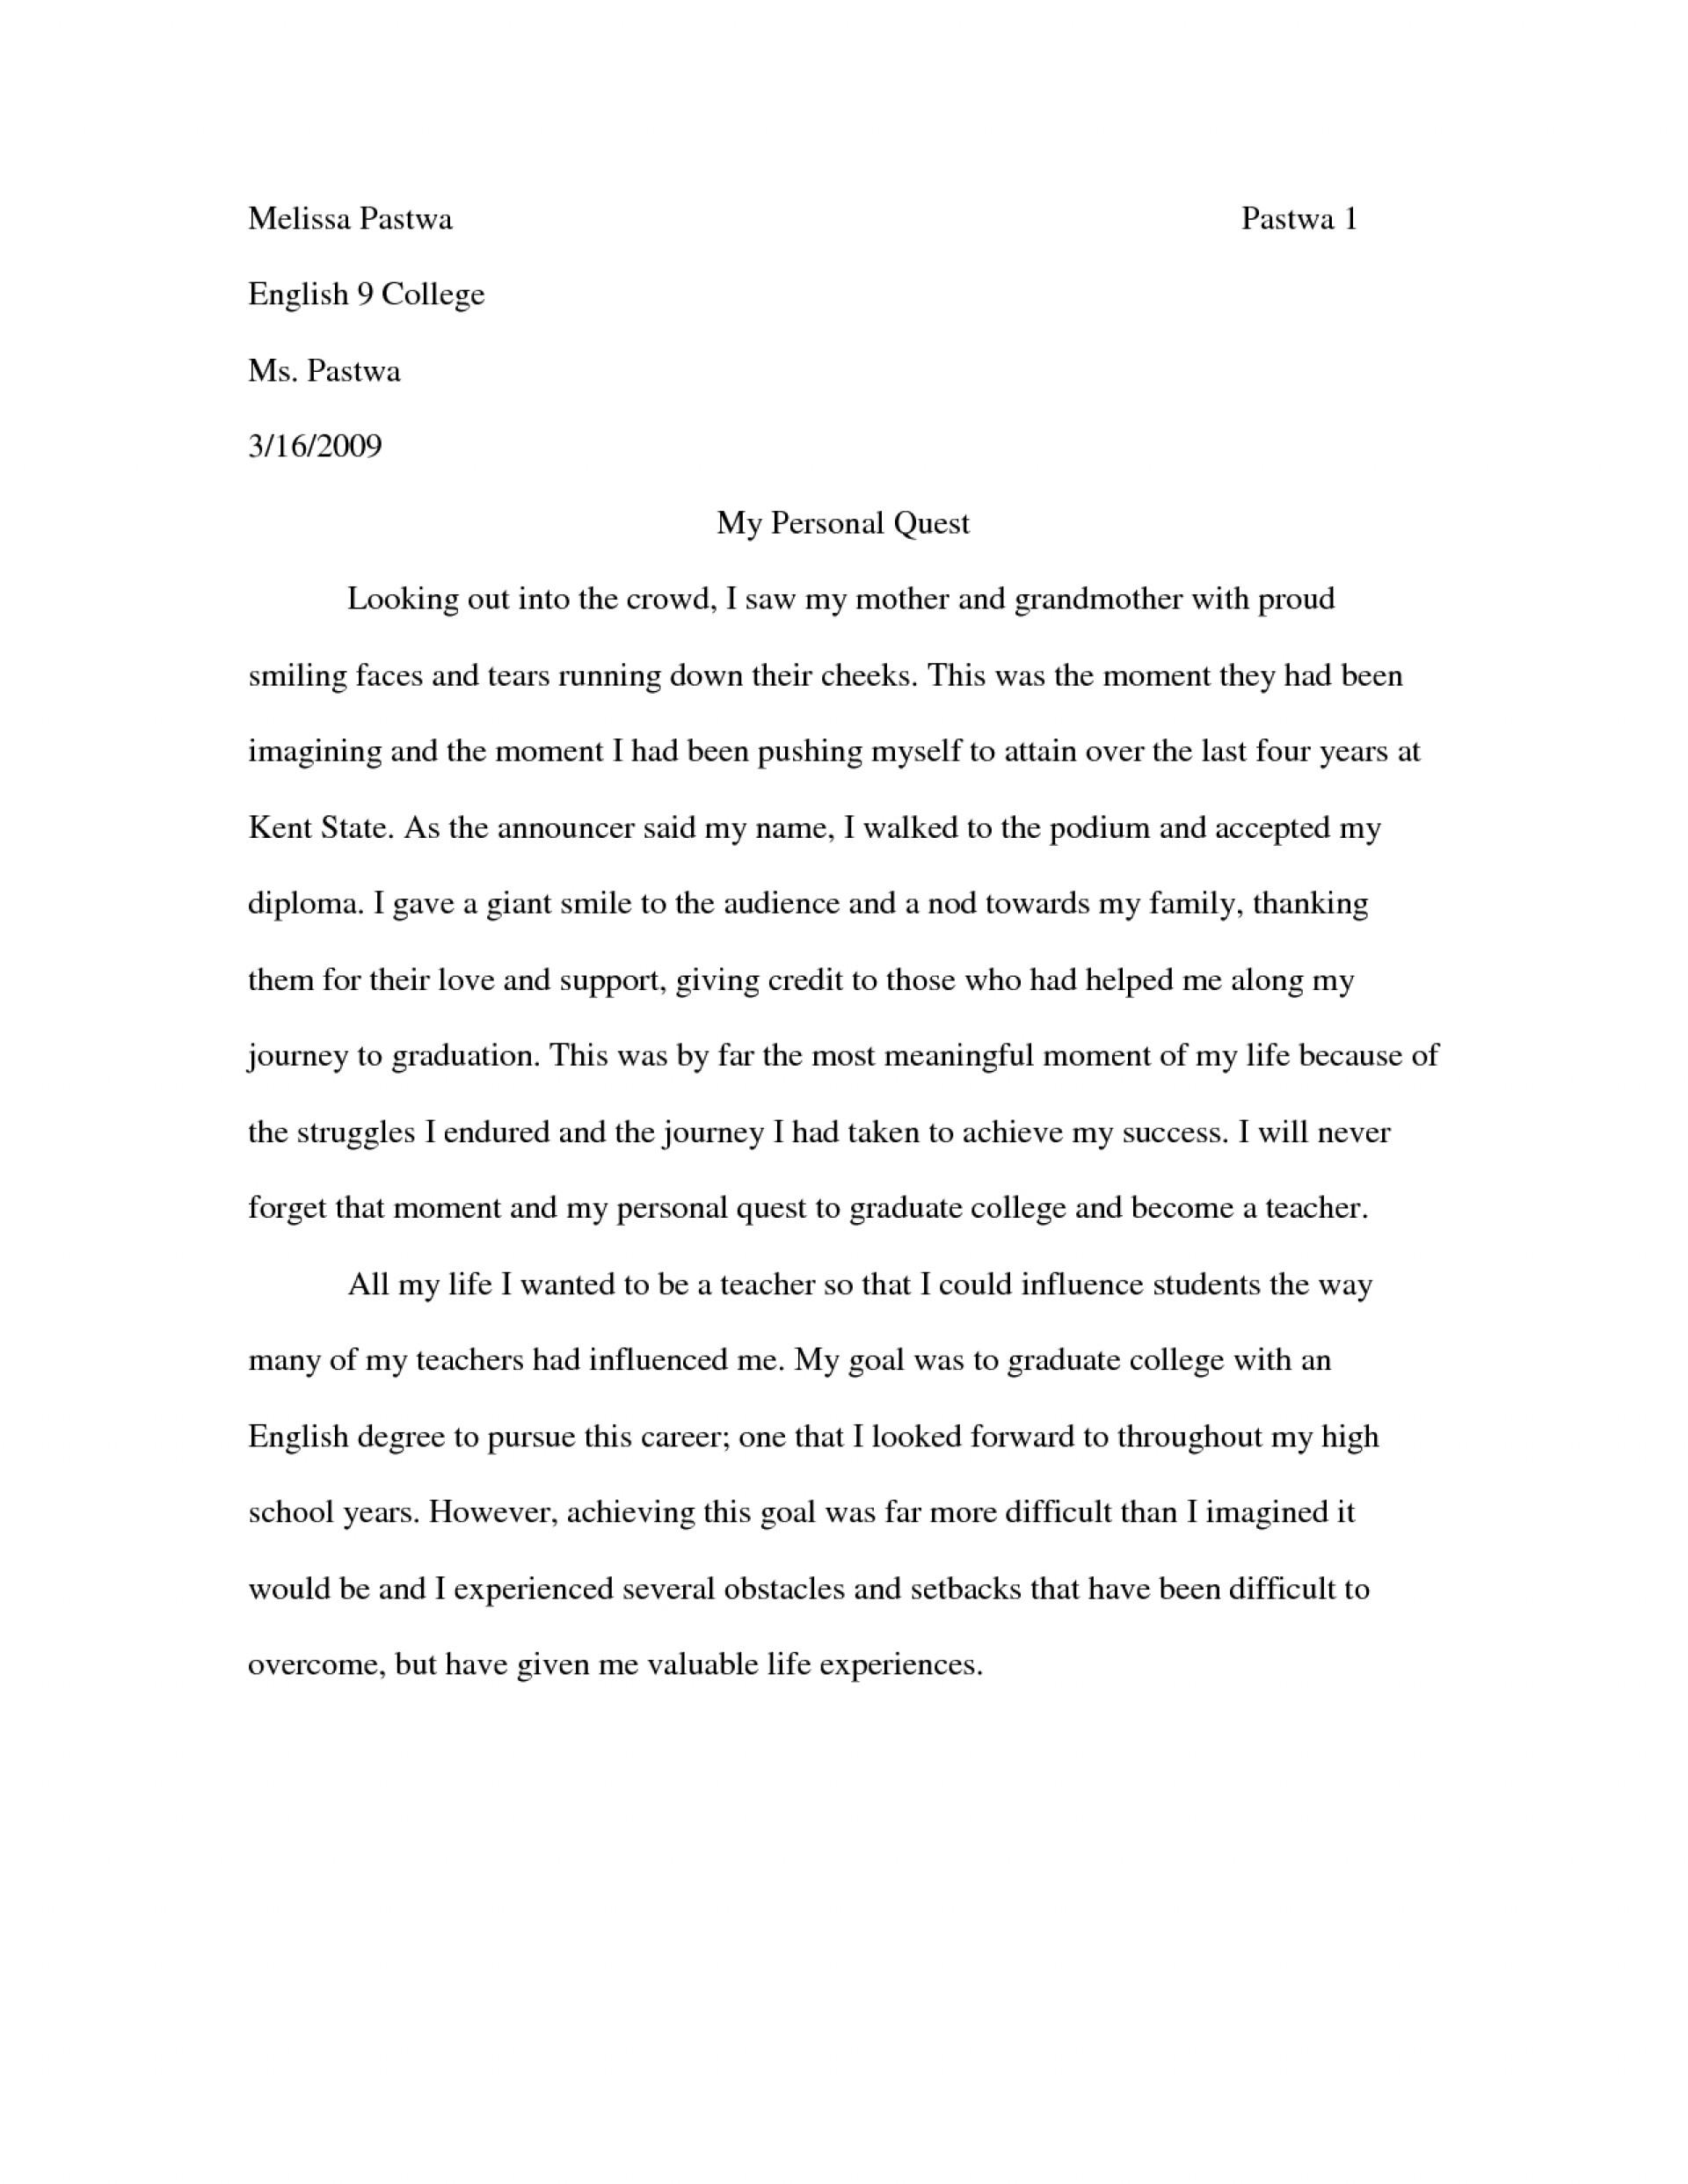 009 Essay Example College Examples Printables Corner Harvard Prompts Essays Ecza Solinf Co Best Ucf Prompt Pomona Mit Uc Texas Amherst Astounding 2017-18 2017 1920